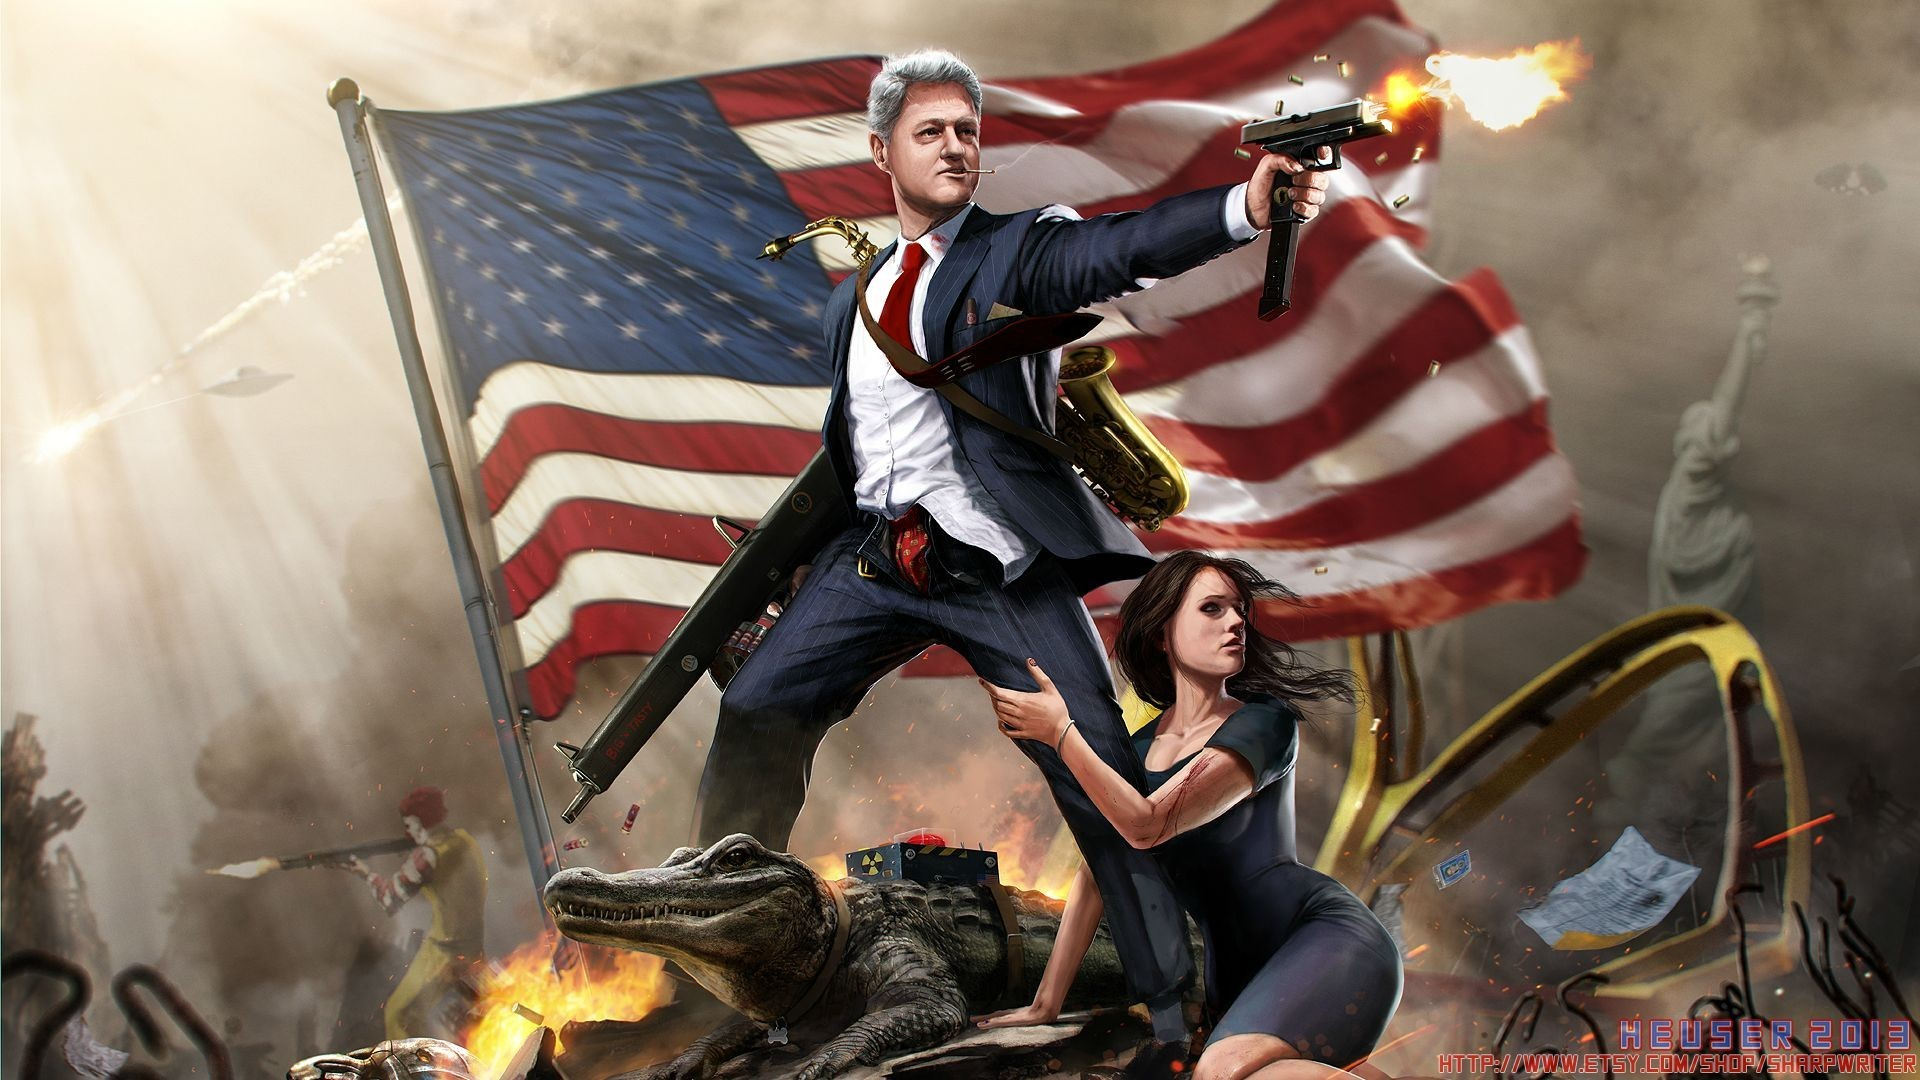 7 Badass Digital Art Wallpapers of United States Presidents   DigitalArt.io